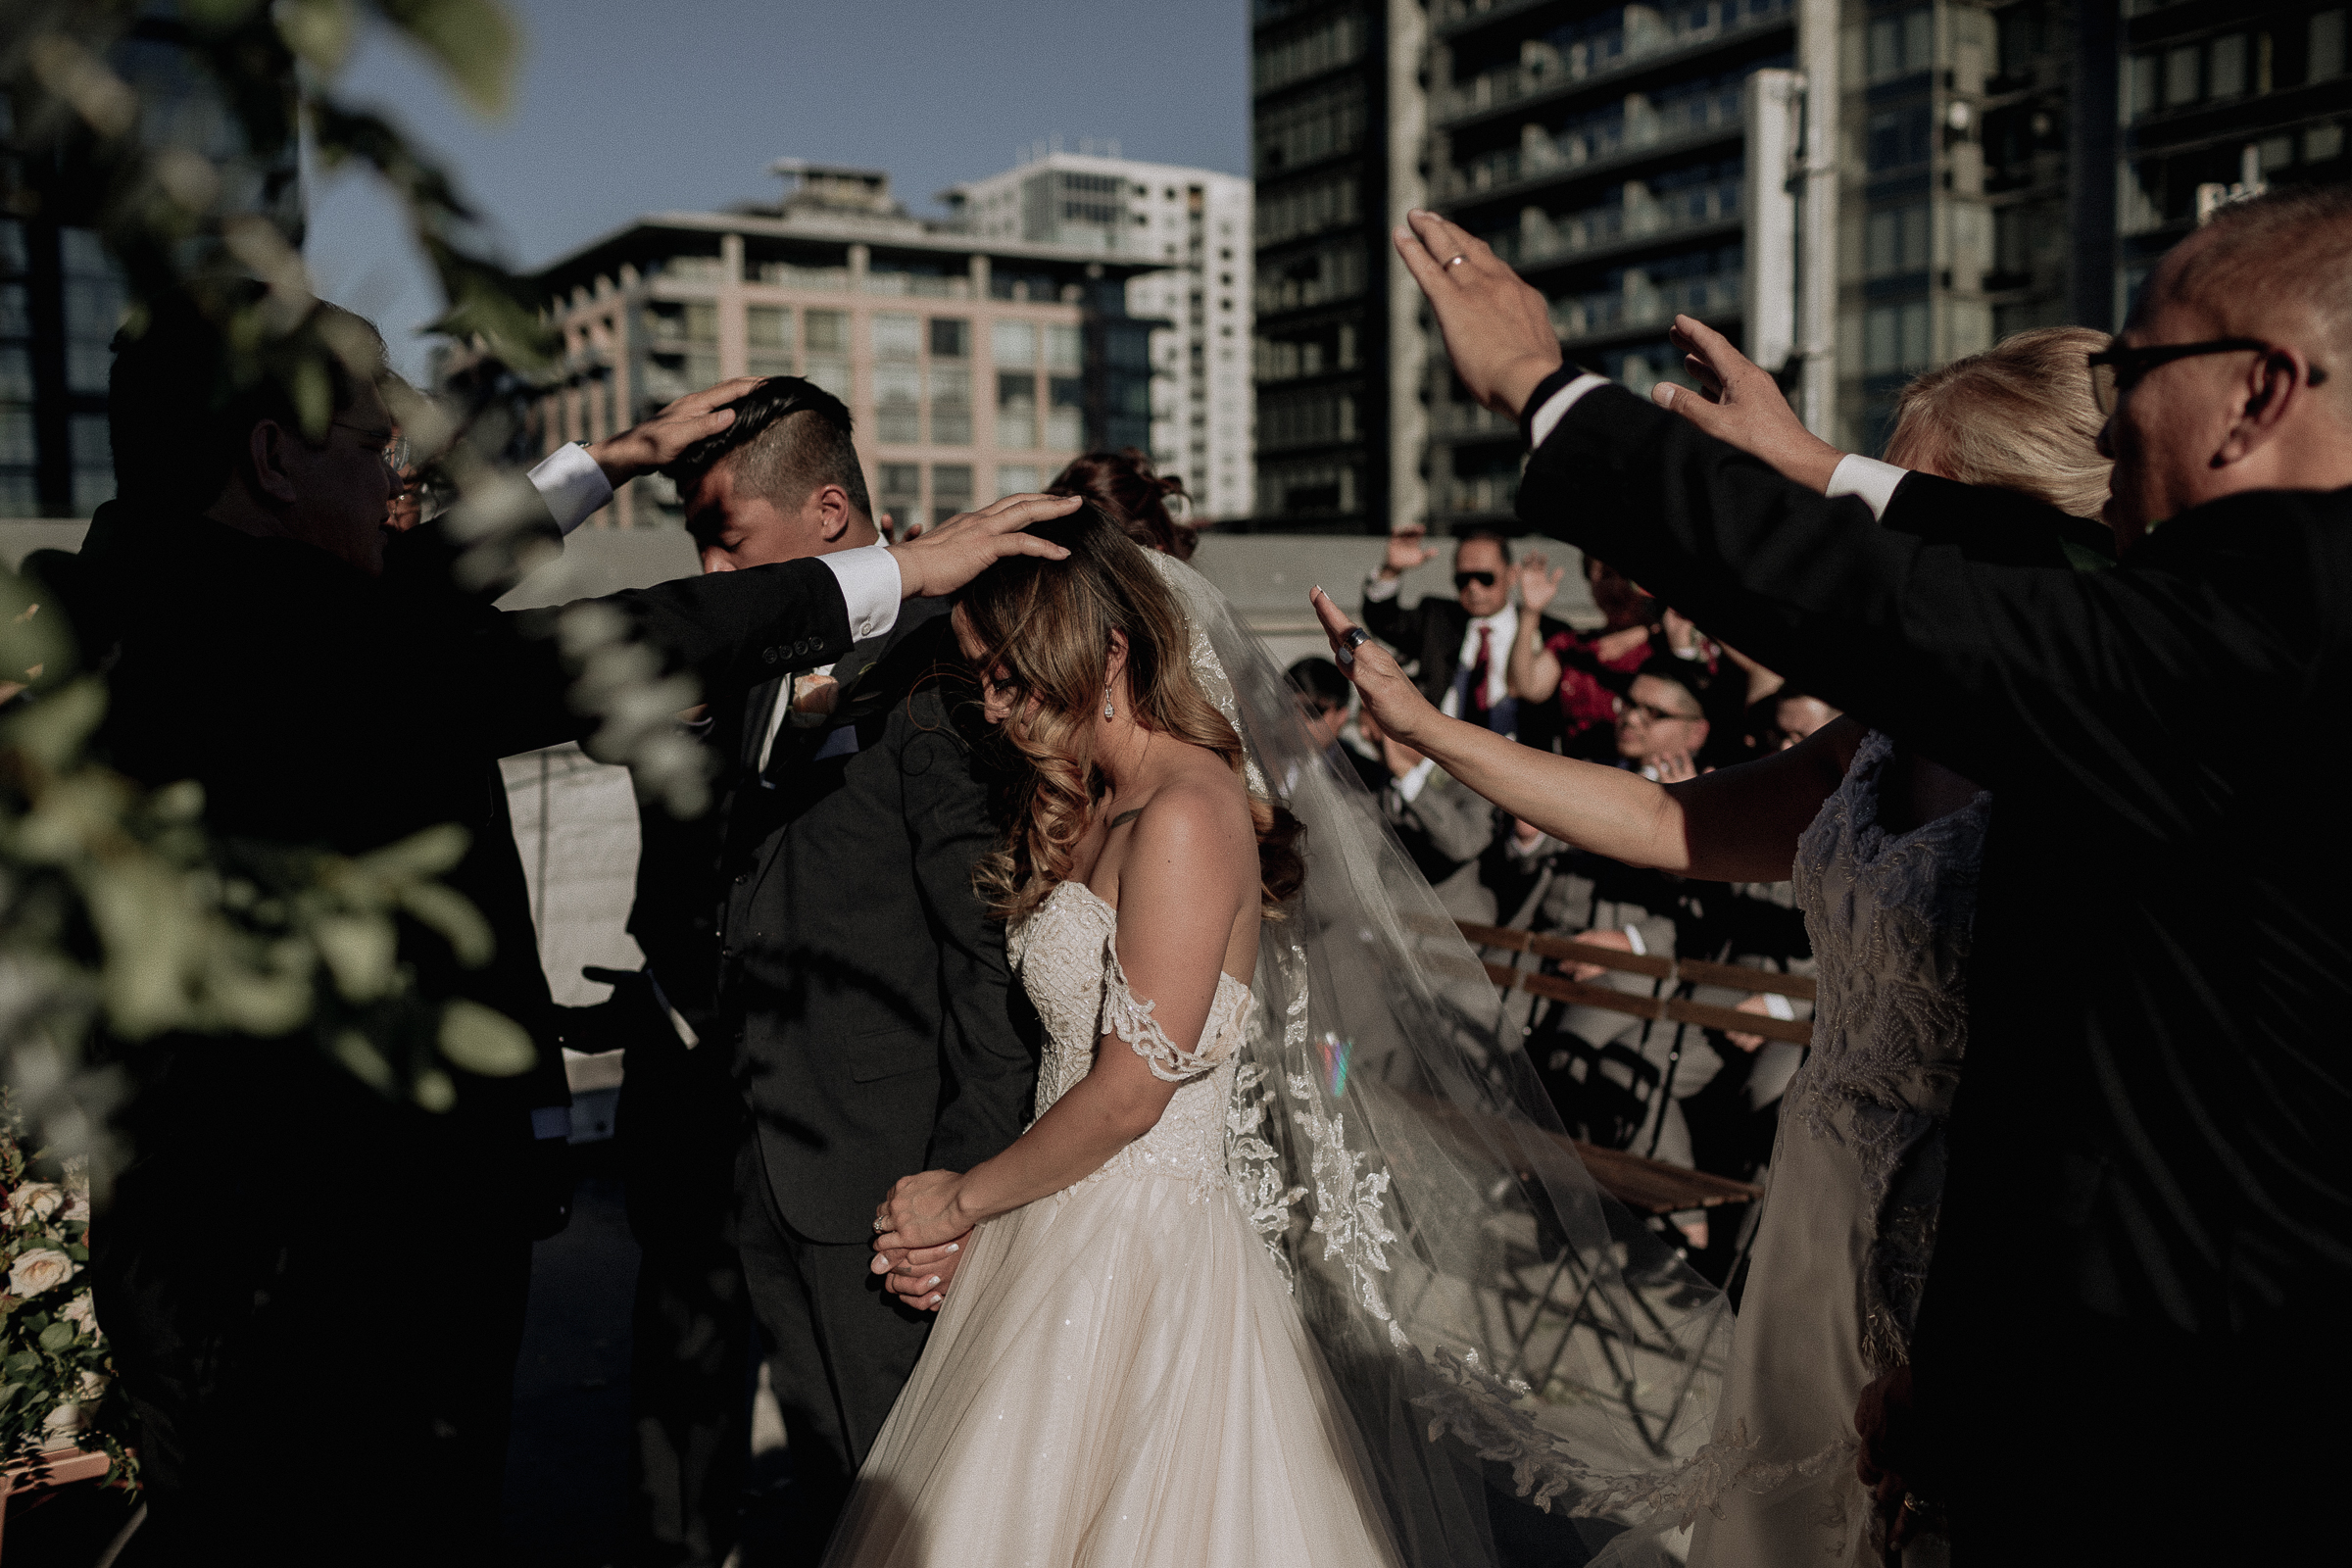 Gretchen Gause Photography | Los Angeles Hudson Loft Wedding #hudsonloft #laweddingphotographer #DTLA #weddingplanning #romanticwedding #rooftopwedding #weddingphotography #weddingdress #prayer